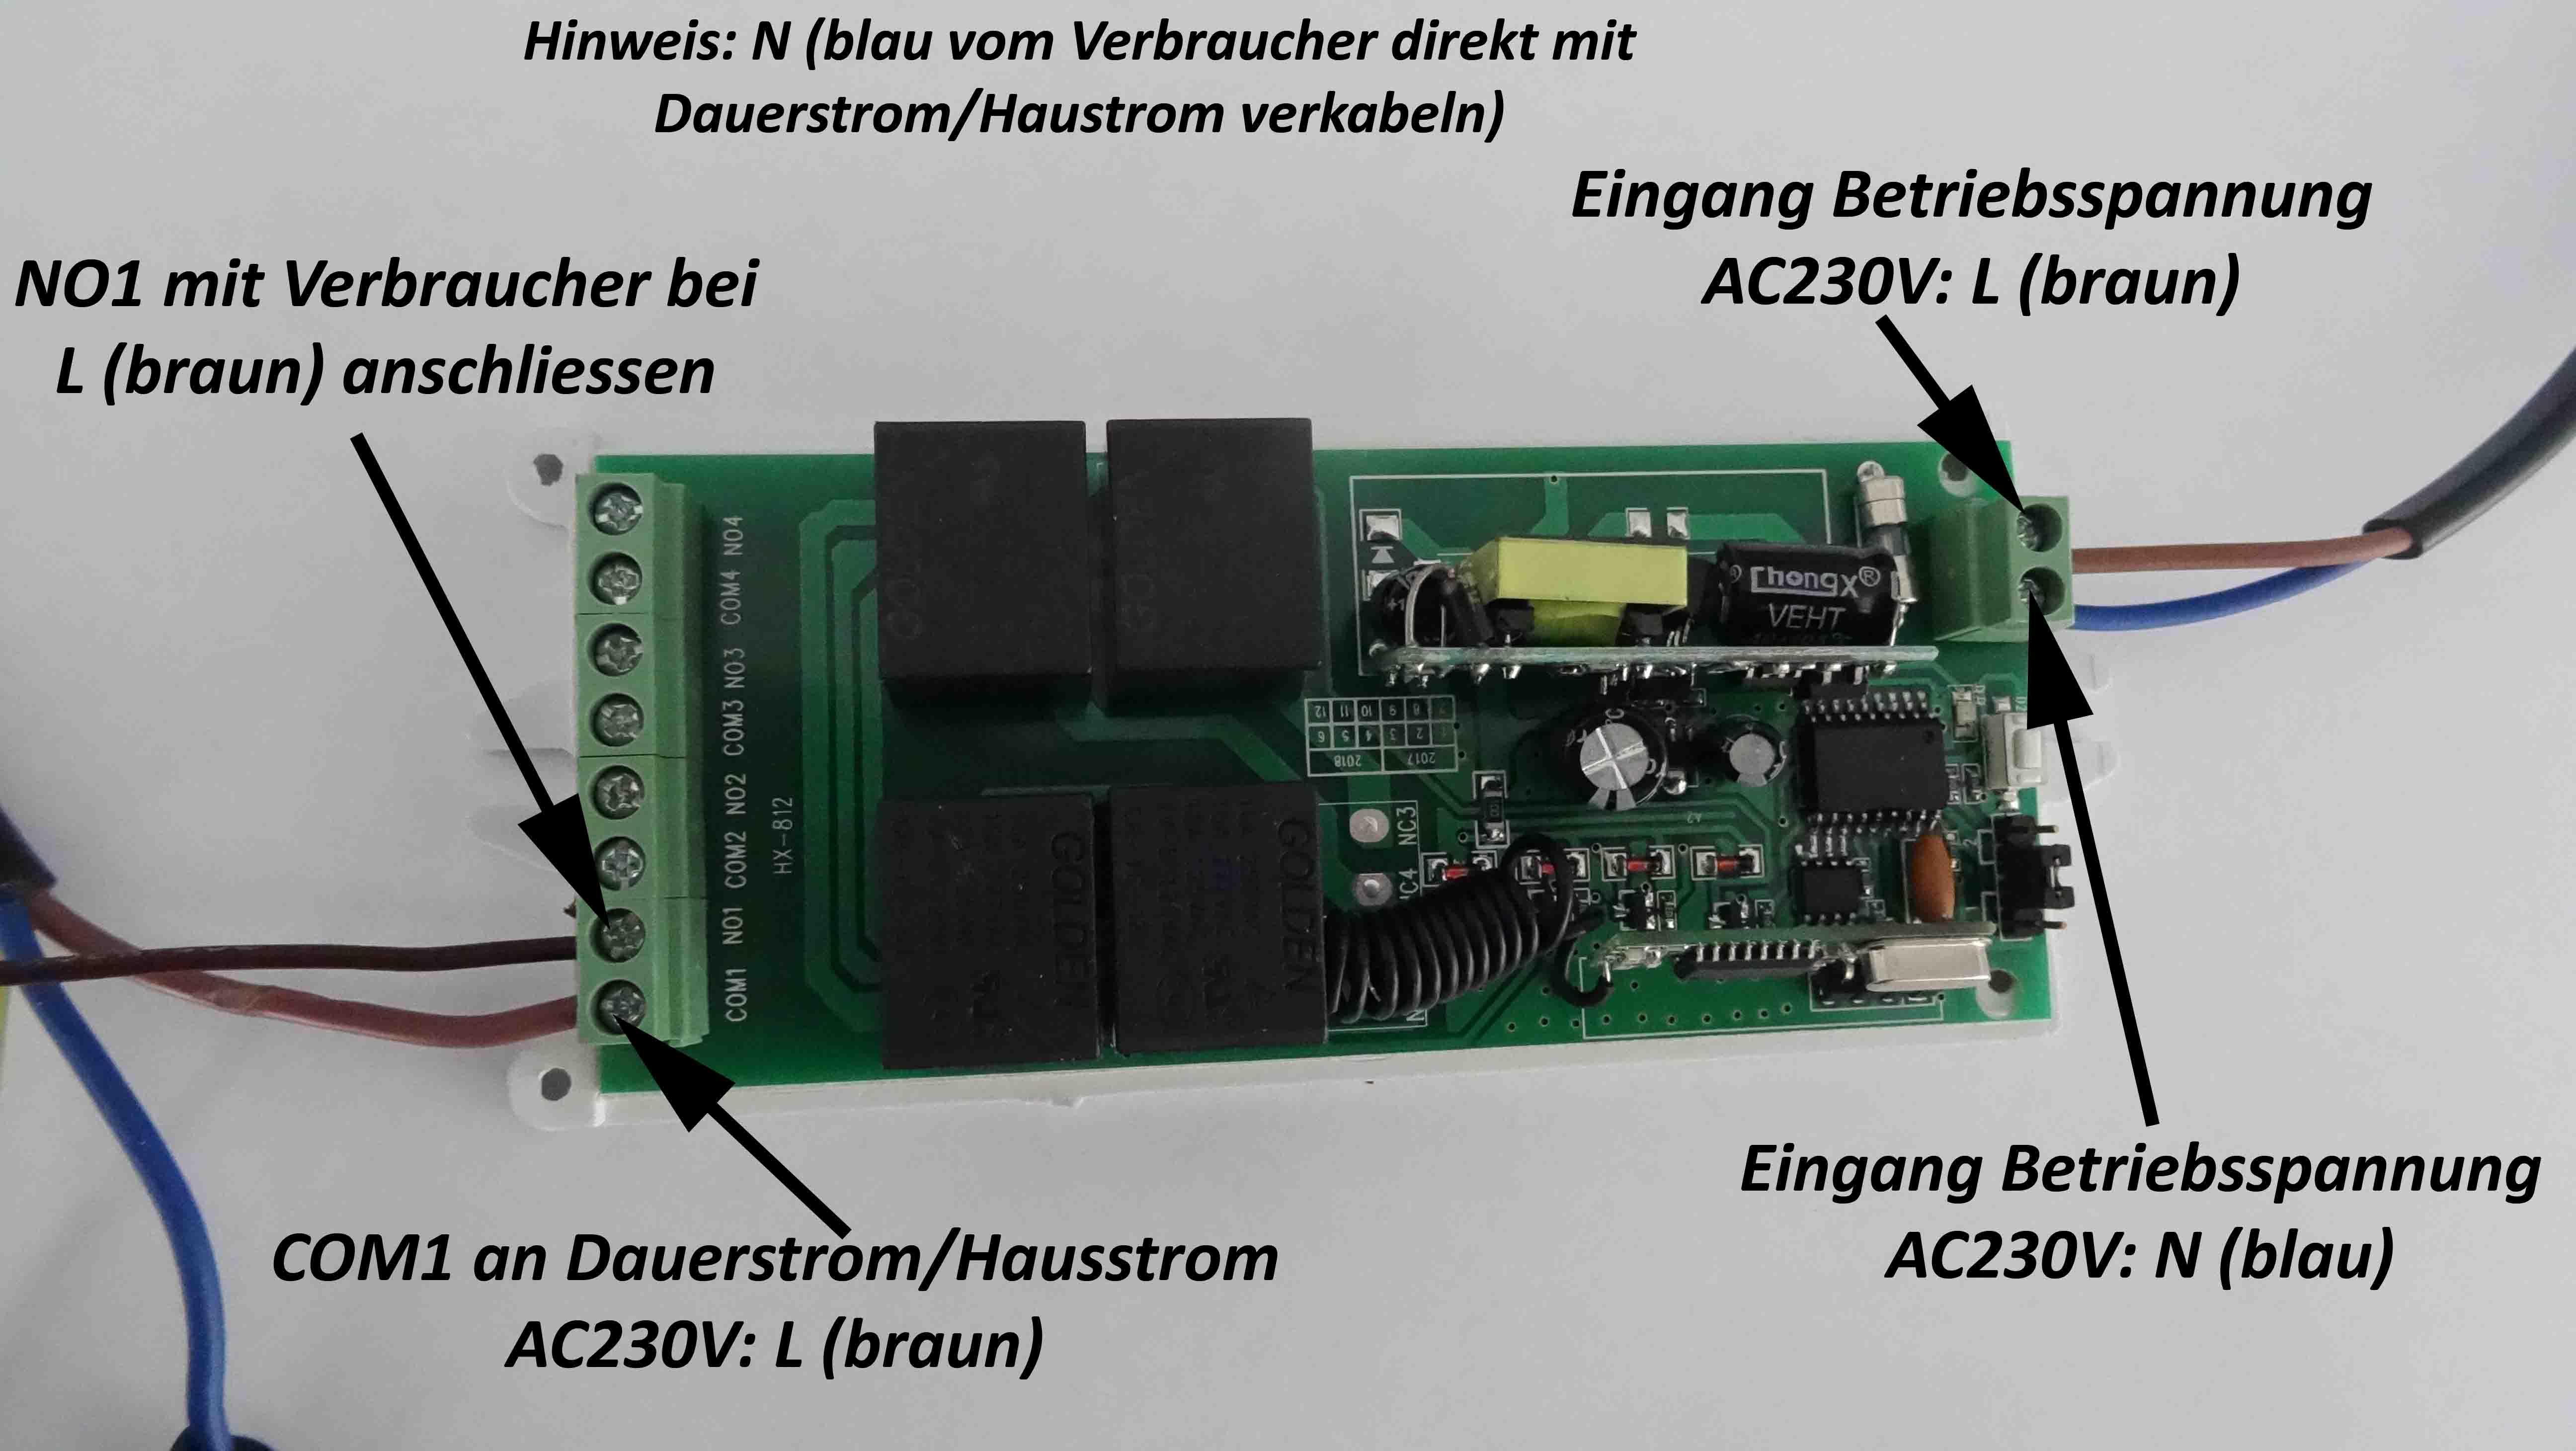 230V 4 Kanal 433Mhz Funk Empfänger Schalter Garagentor Handsender potentialfrei